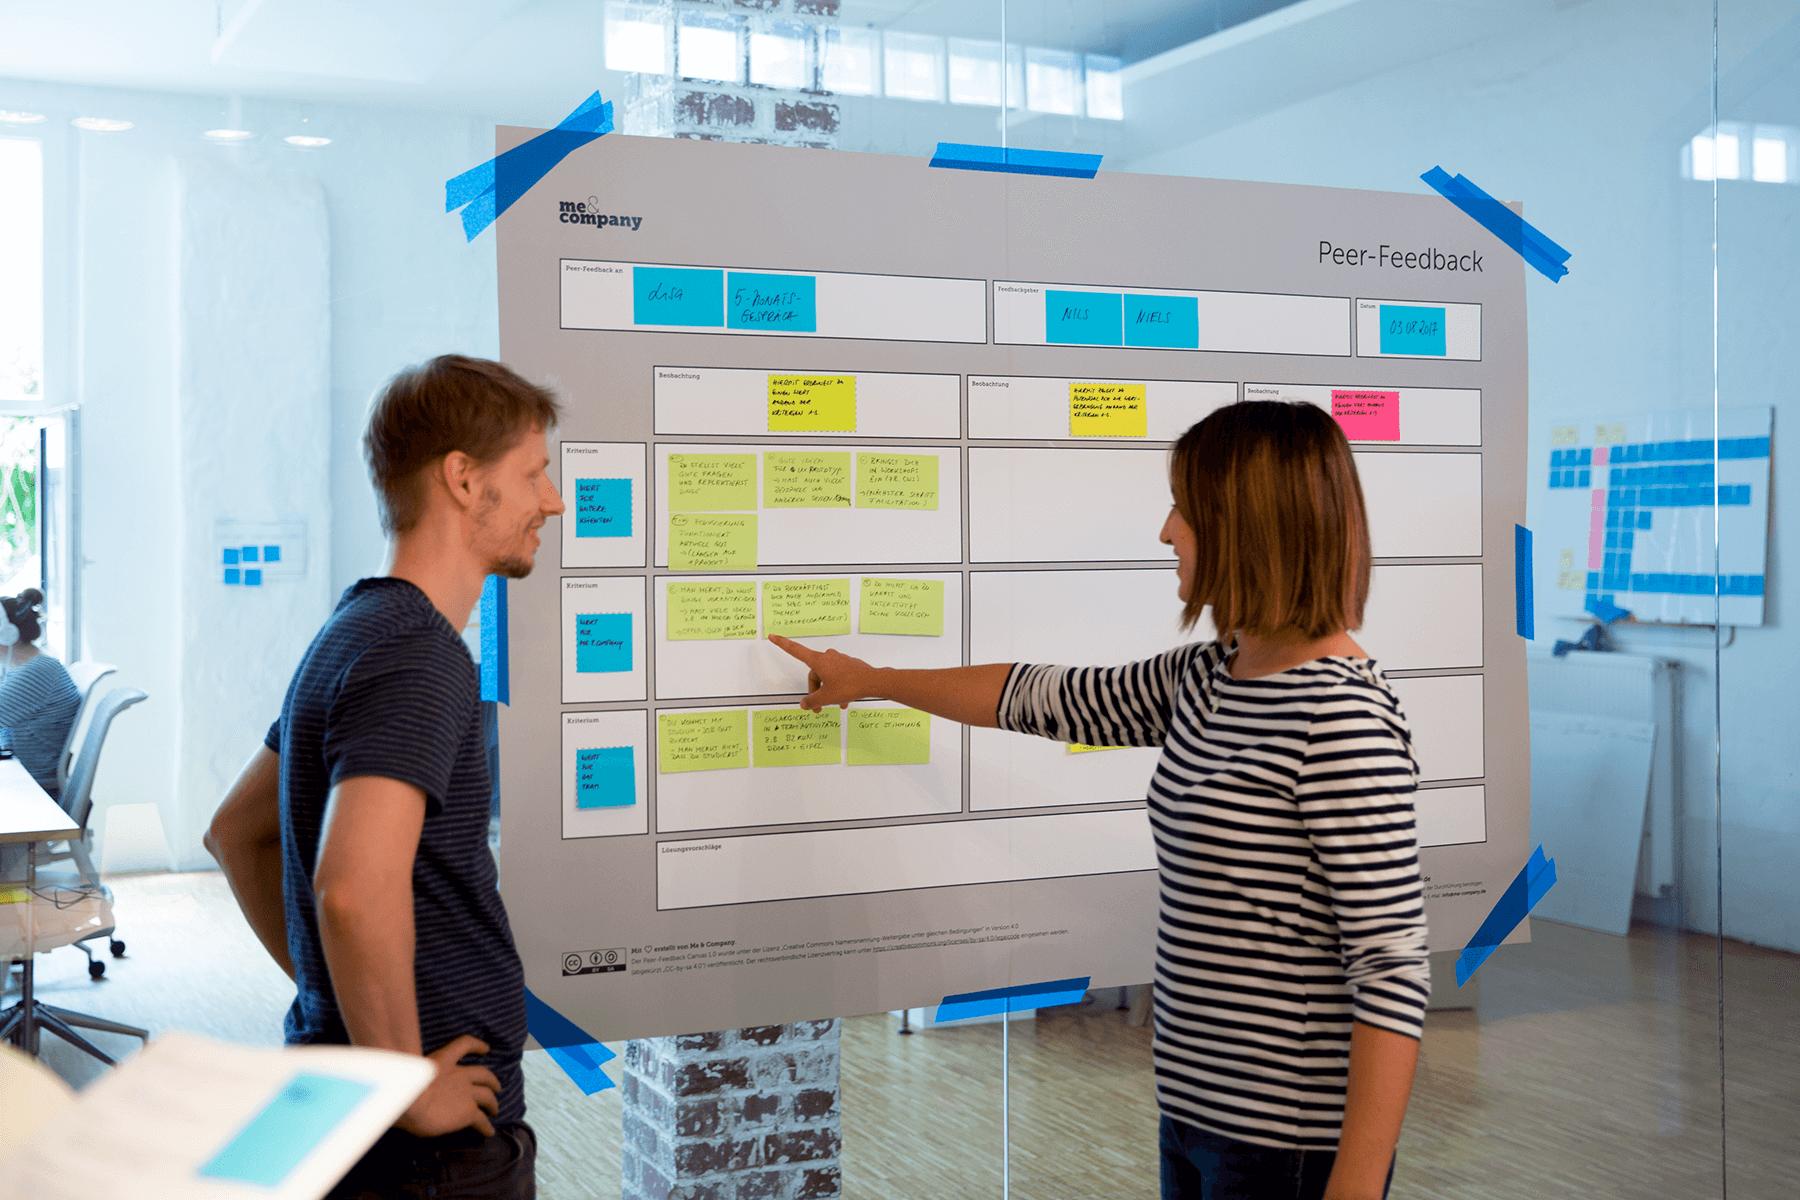 Peer Feedback als Teil des Agile Performance Managements bei Me & Company